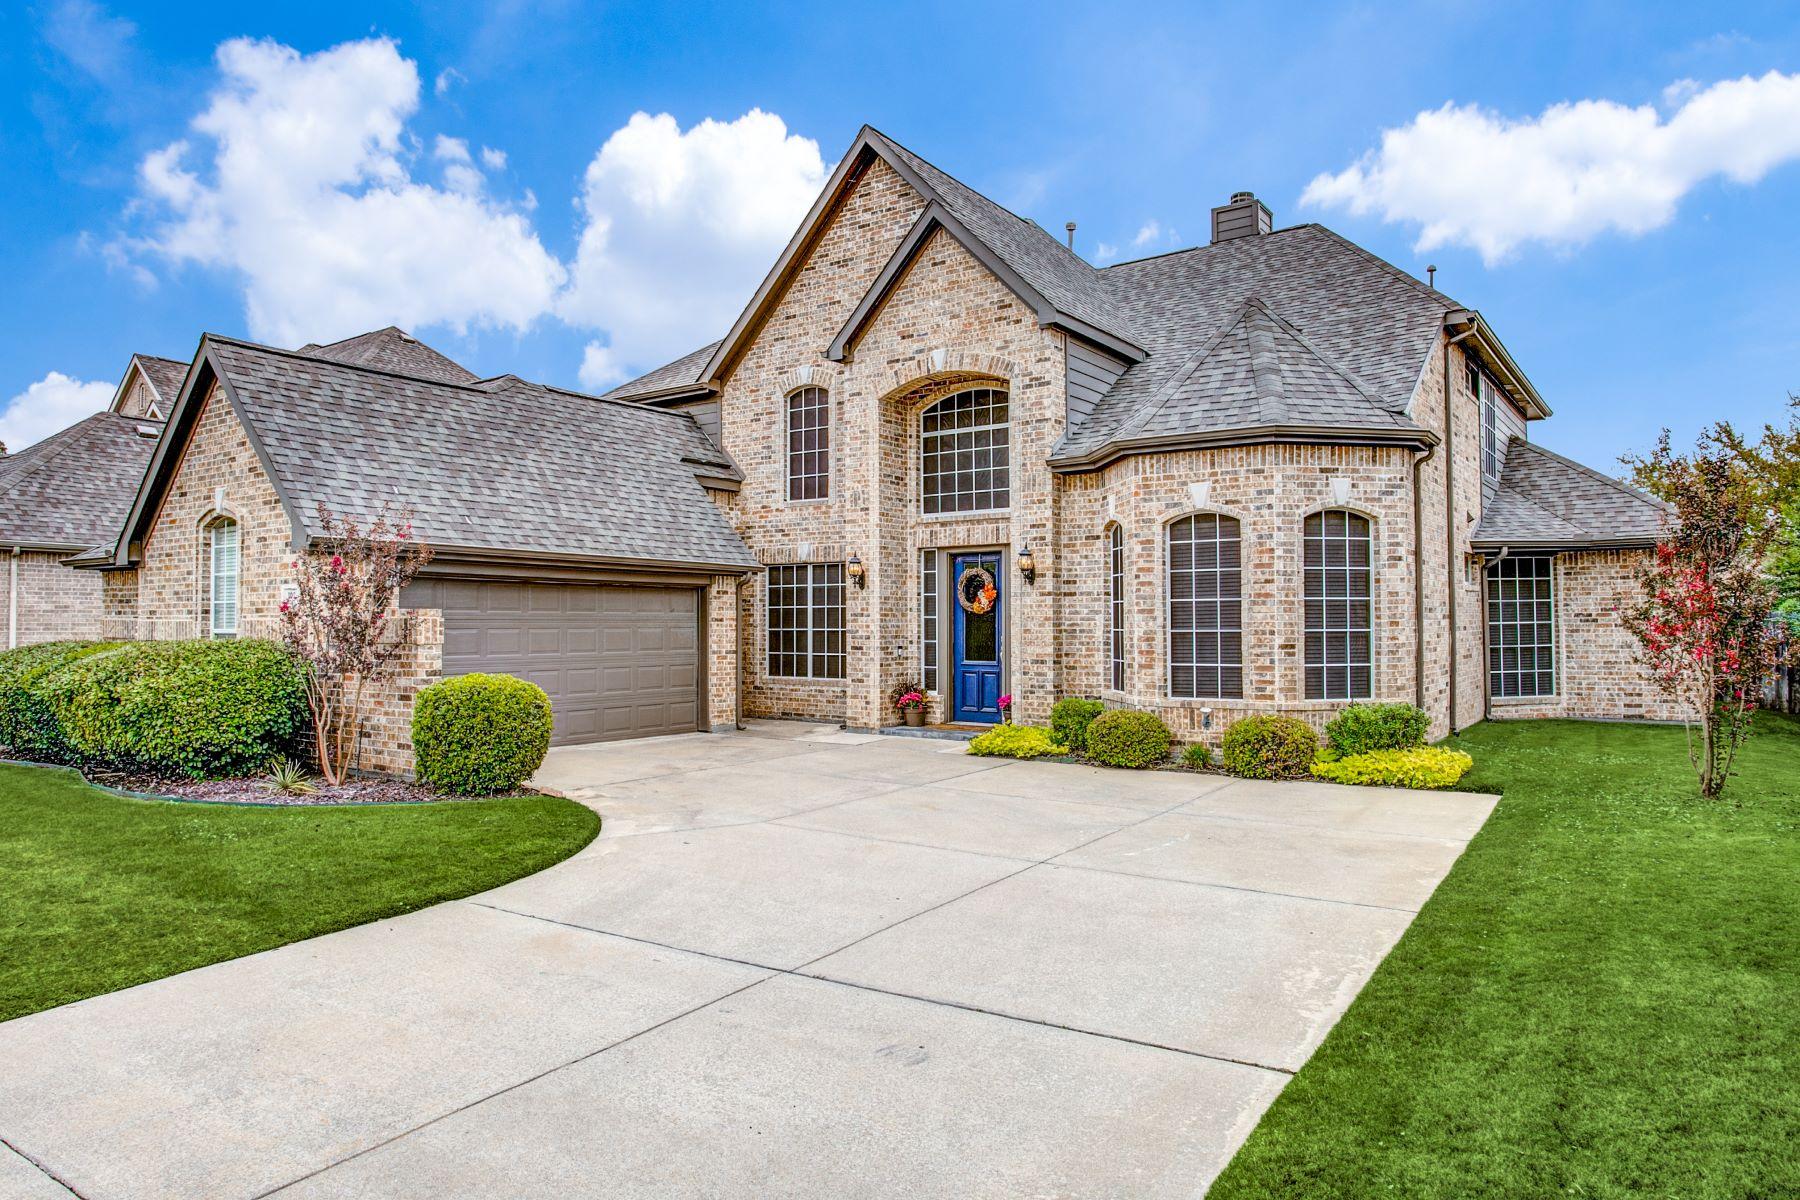 Single Family Homes for Sale at Gated Bear Creek Keller Community 707 Renaissance Court Keller, Texas 76248 United States